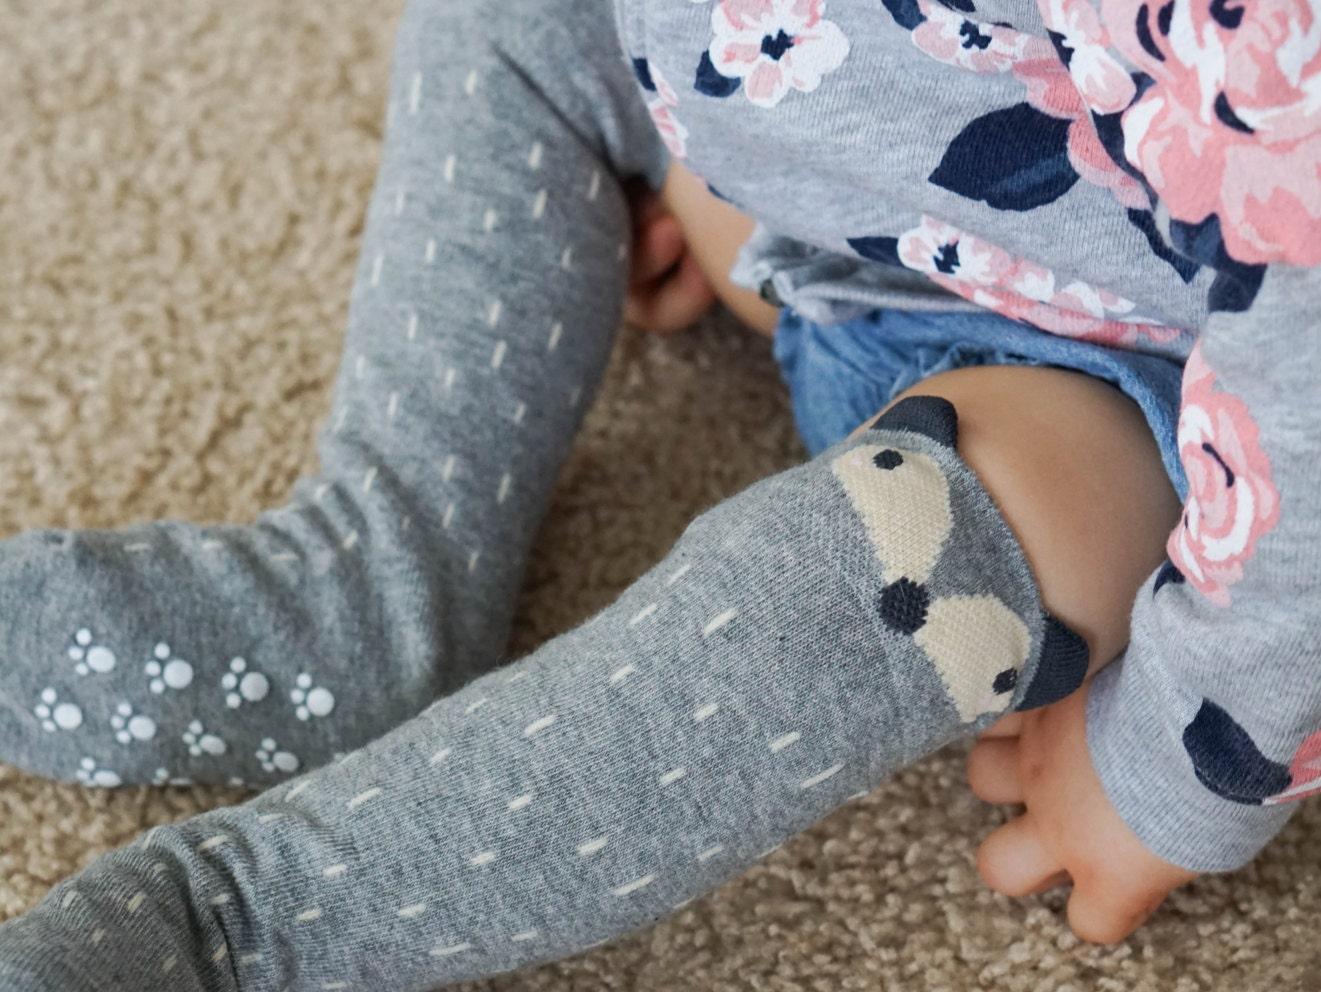 Baby RACCOON SOCKS PERSONALIZED Knee High Fox Socks Animal